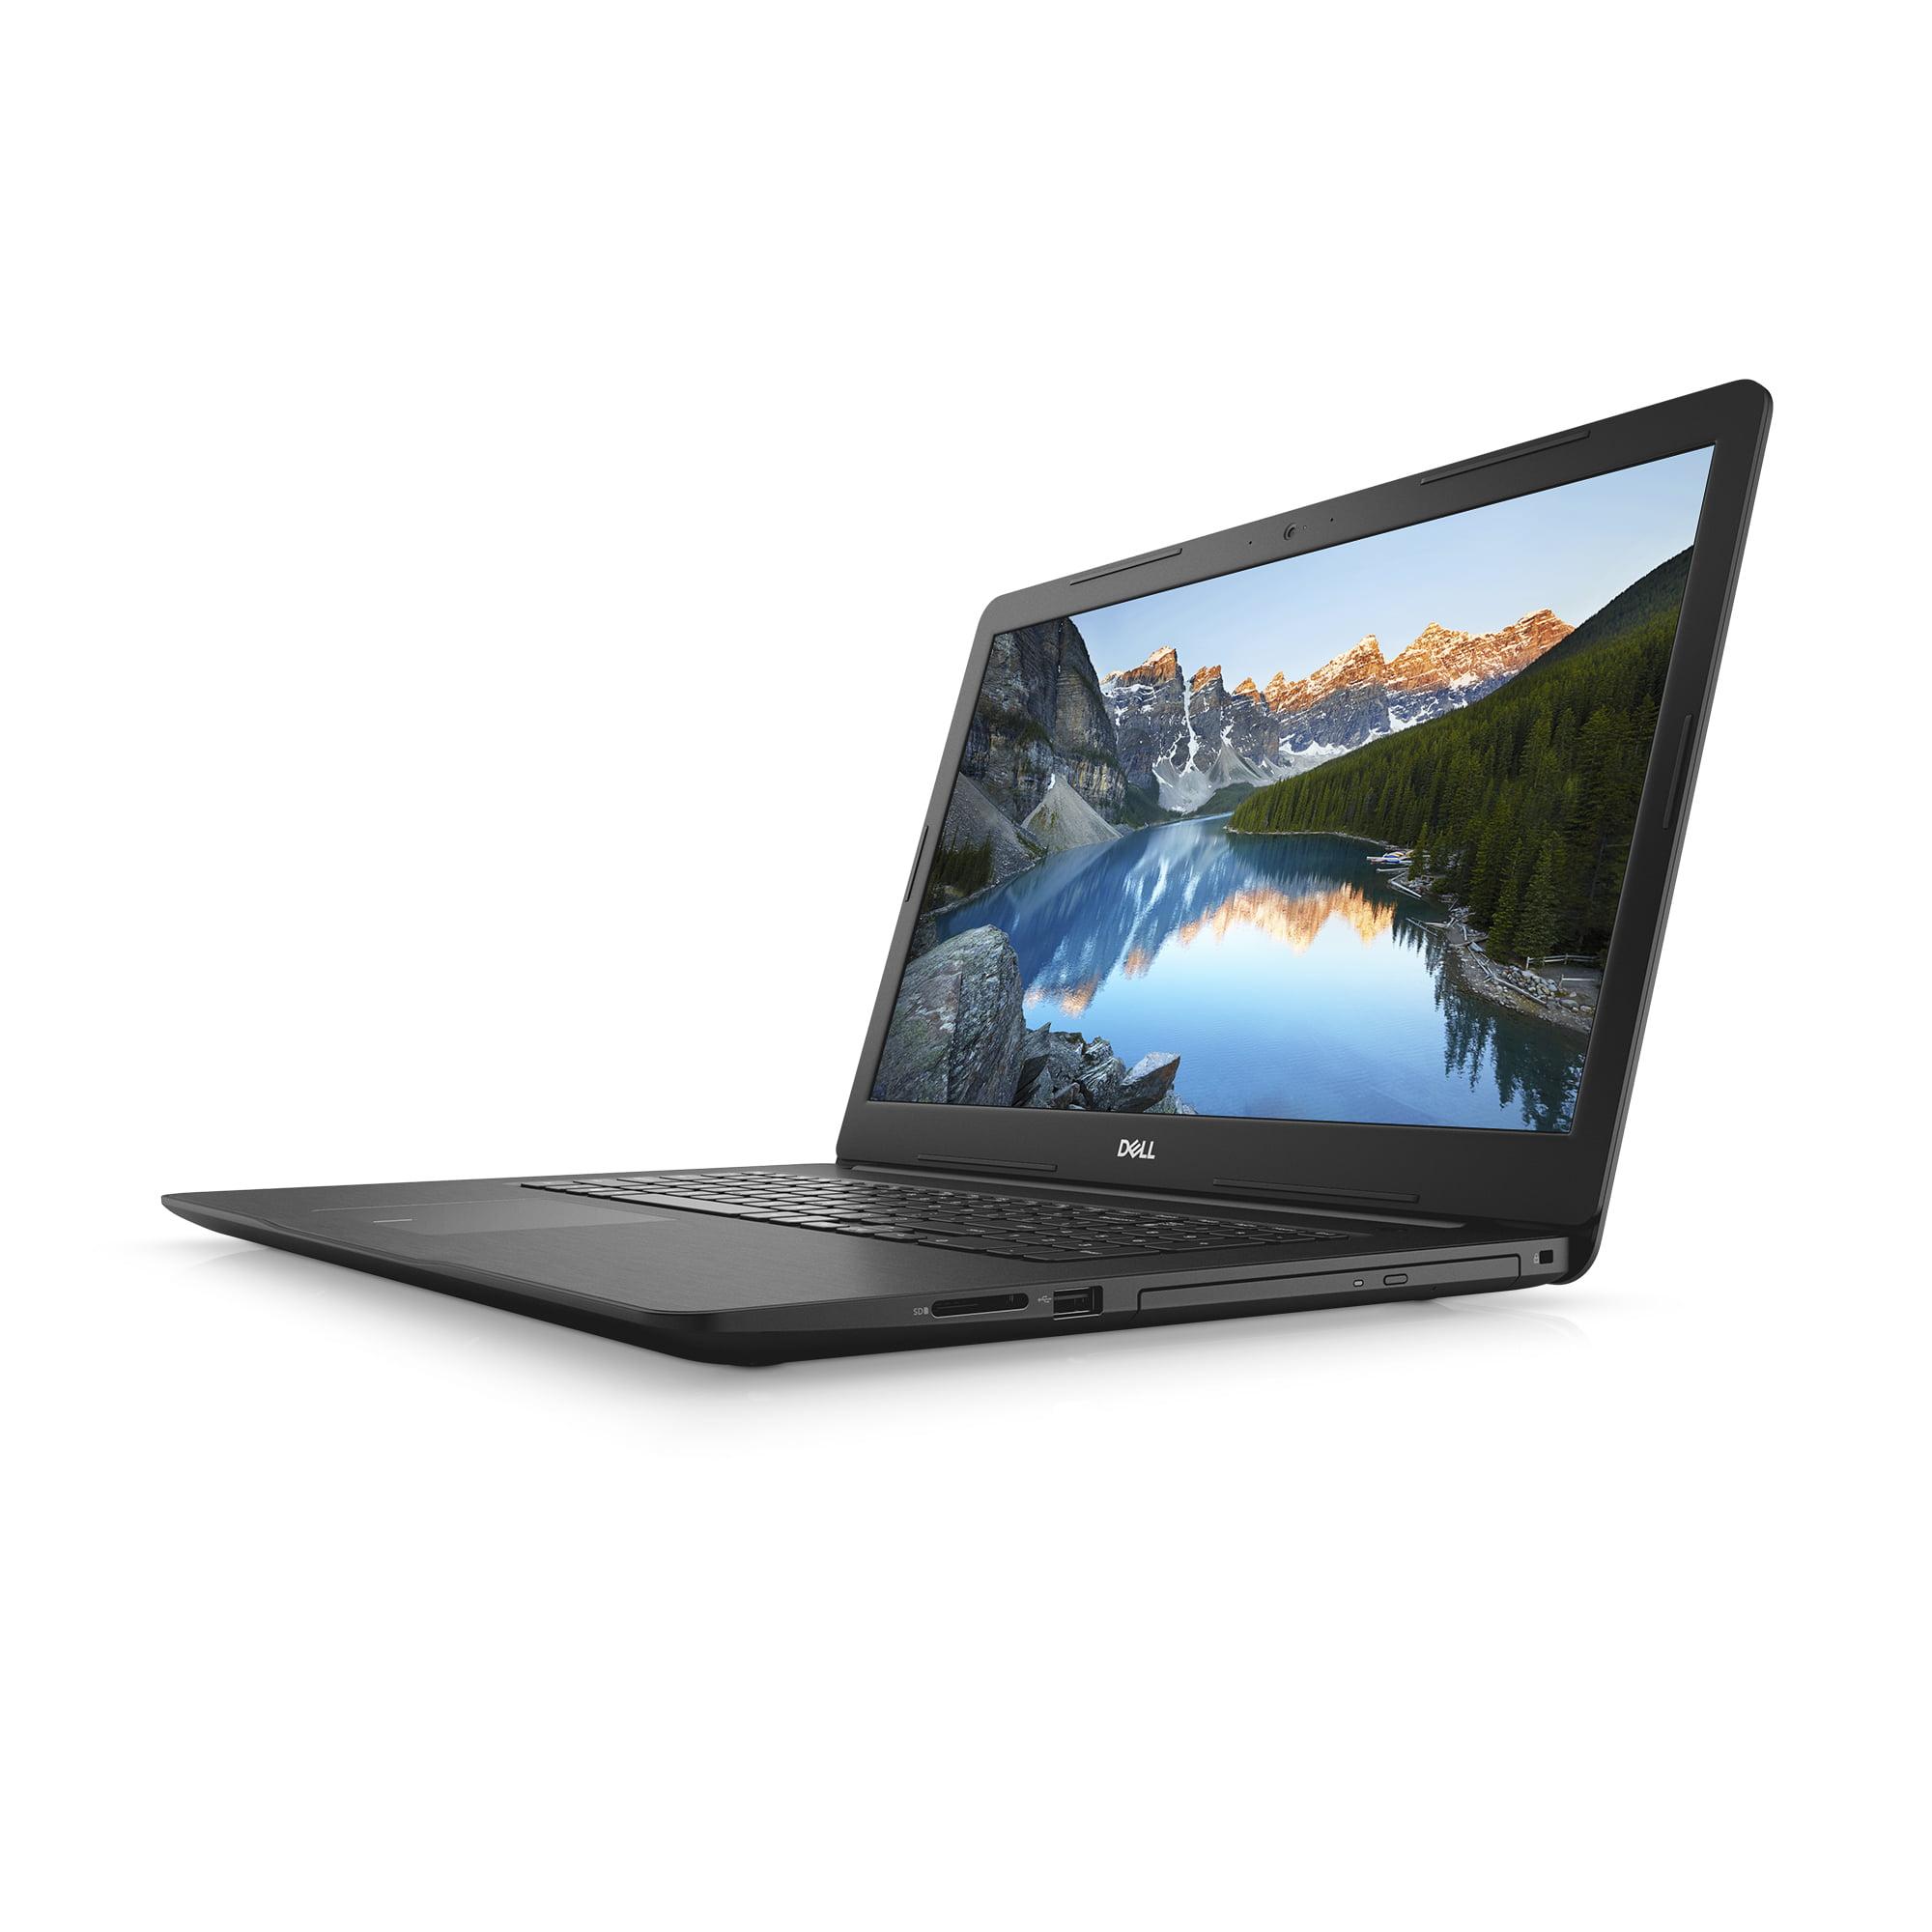 "Dell Inspiron 15 5000 (5575) Laptop, 15 6"", AMD Ryzen 5"